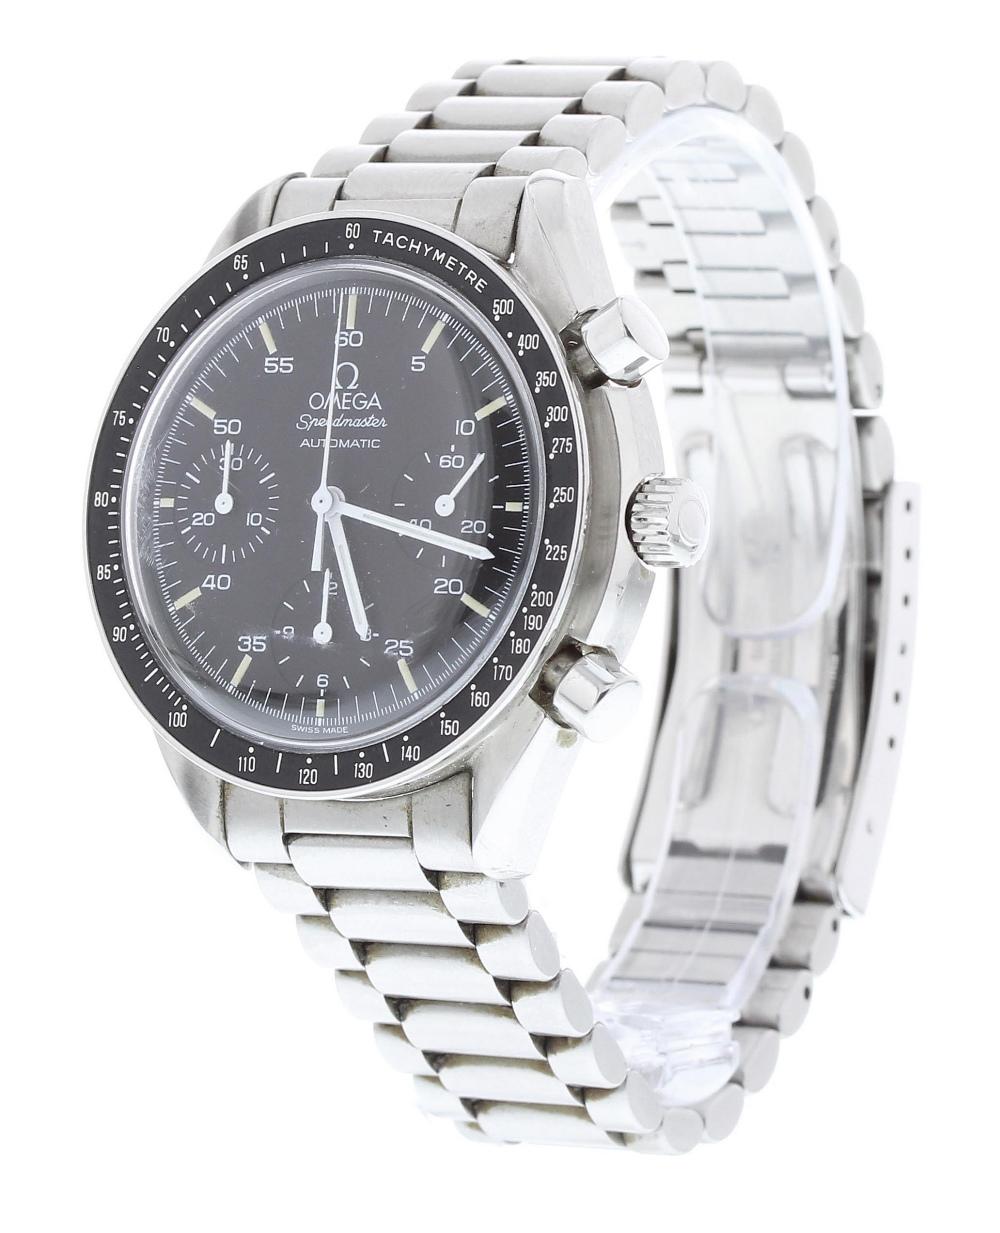 Lot 18 - Omega Speedmaster chronograph automatic stainless steel gentleman's bracelet watch, ref. ST 3750032,